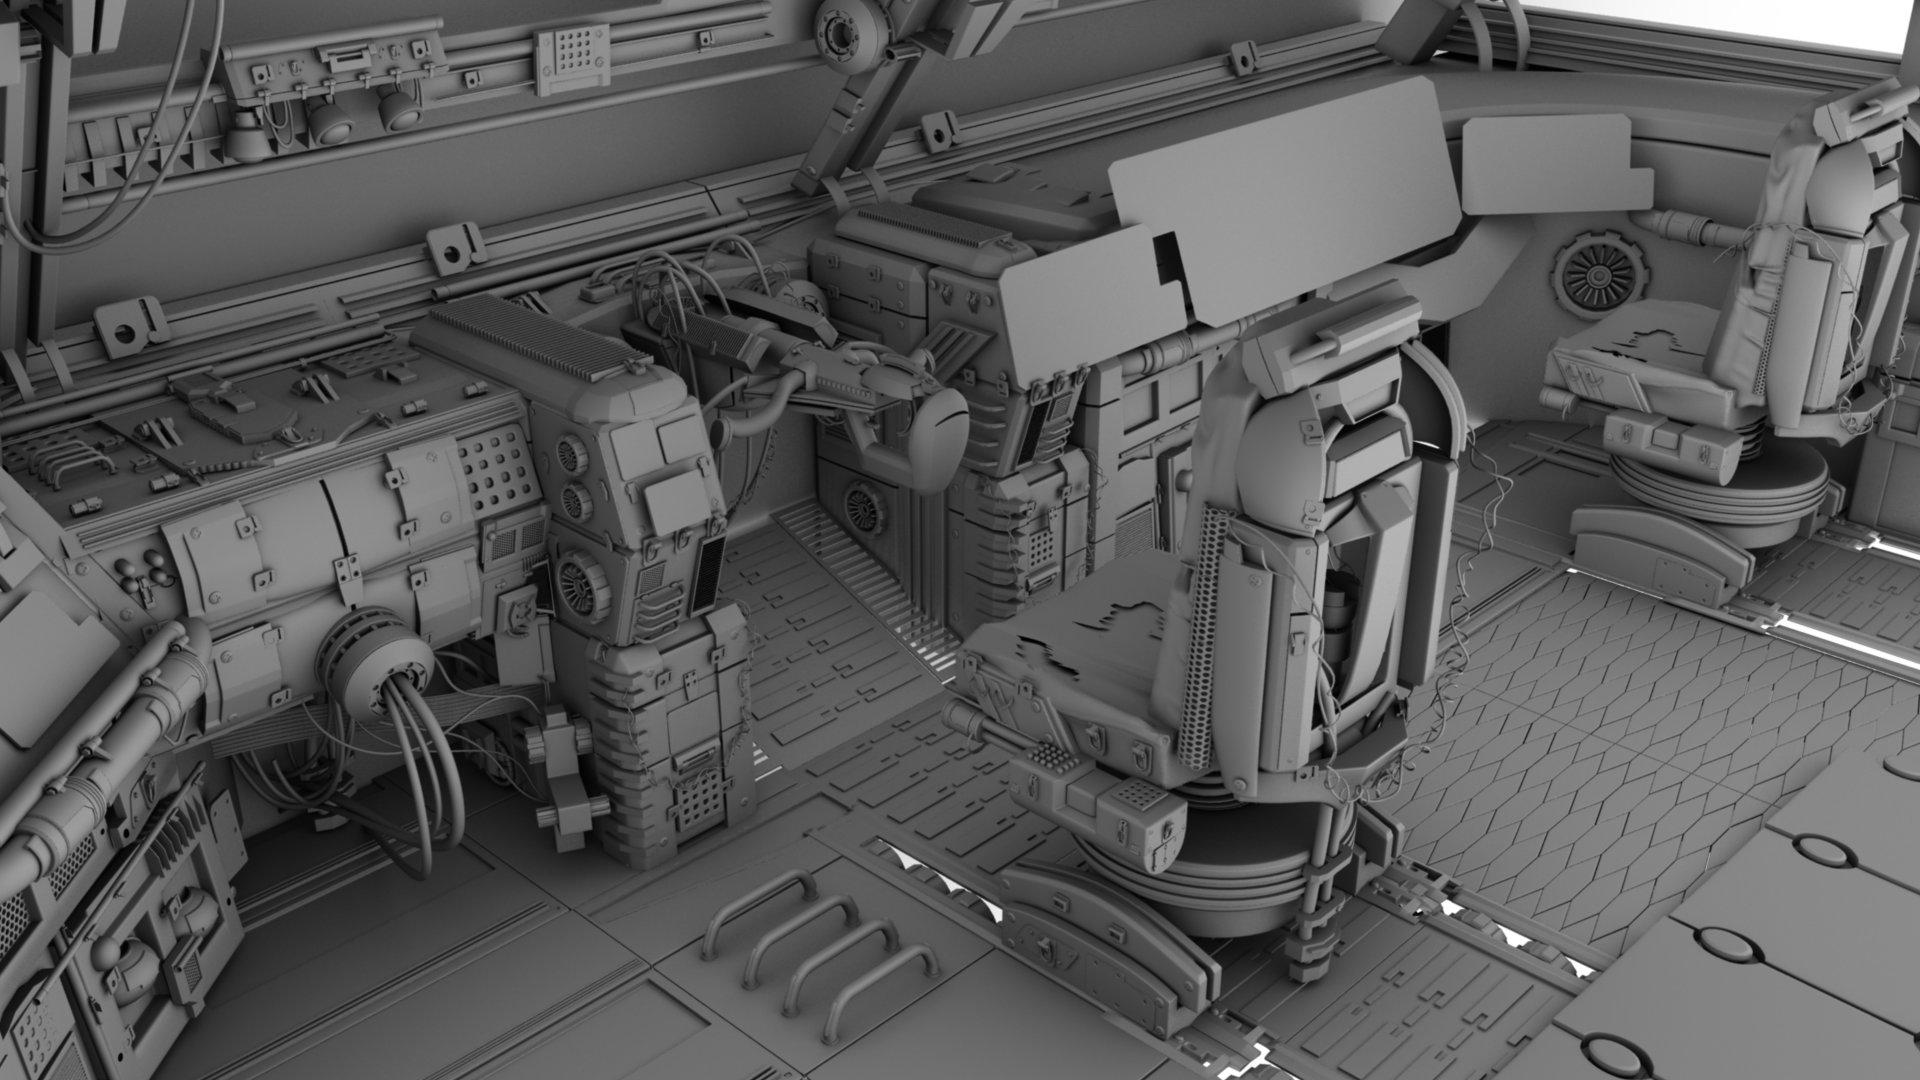 ArtStation - Dead Space Cockpit, Christen Smith